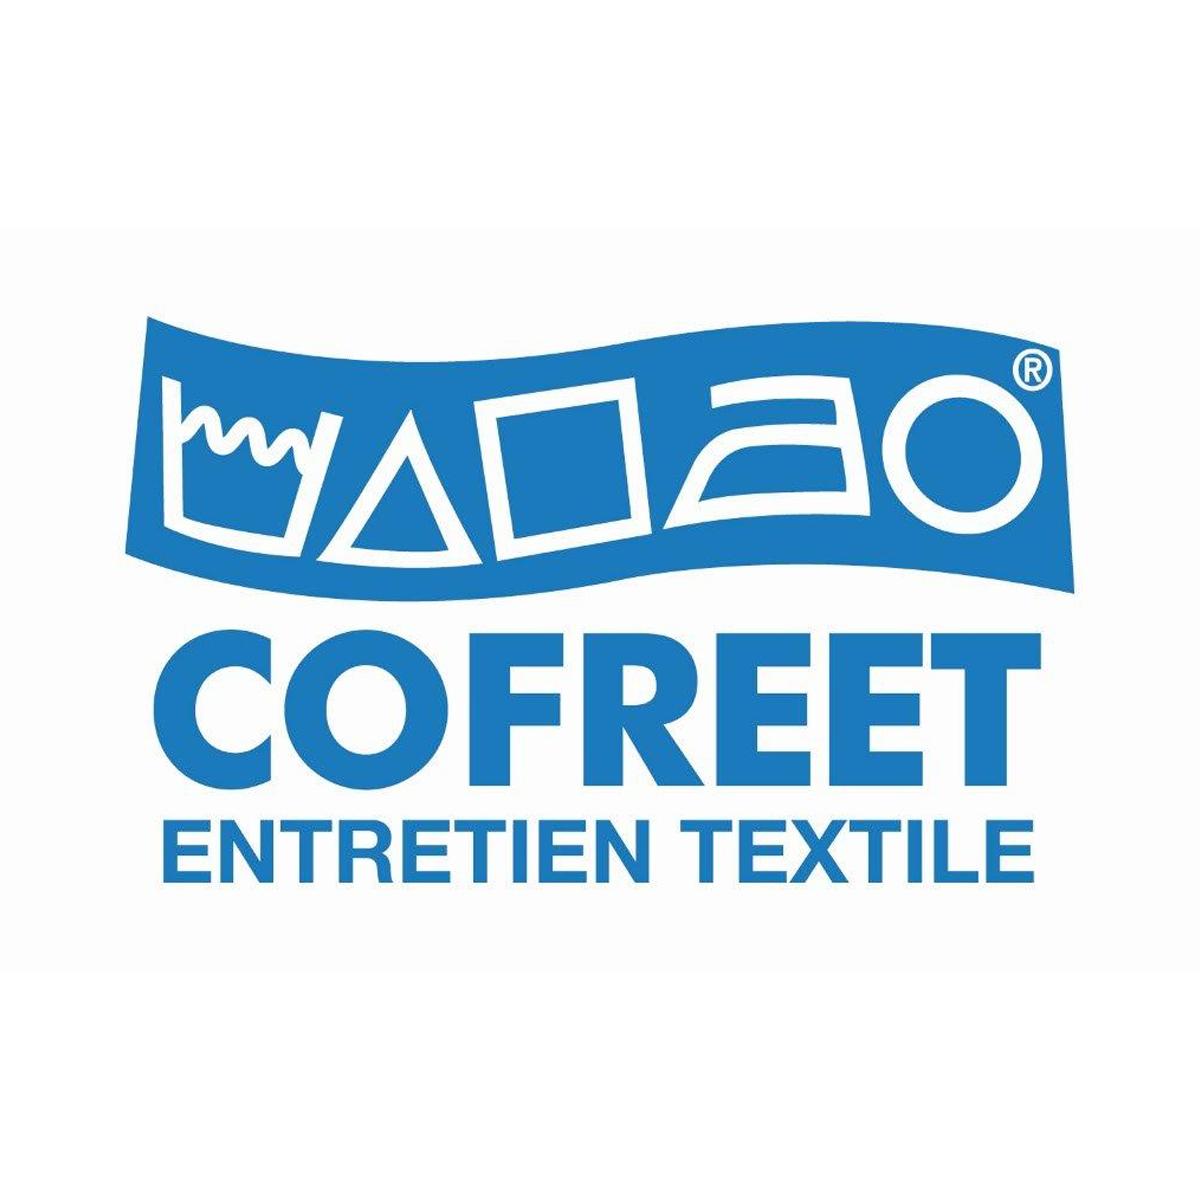 cofreet logo réseau